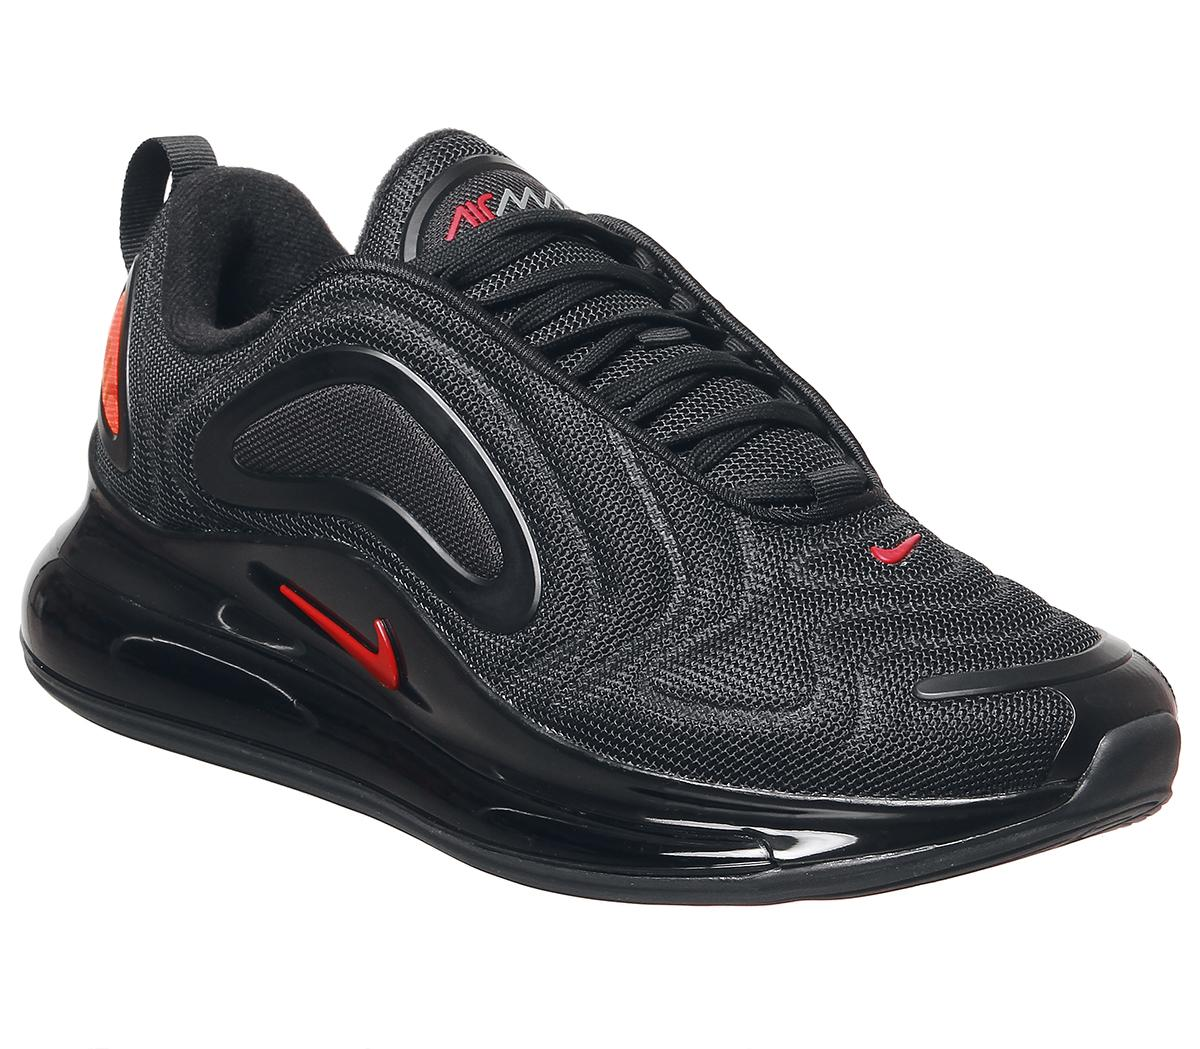 Nike Air Max 720 Trainers Black Hyper